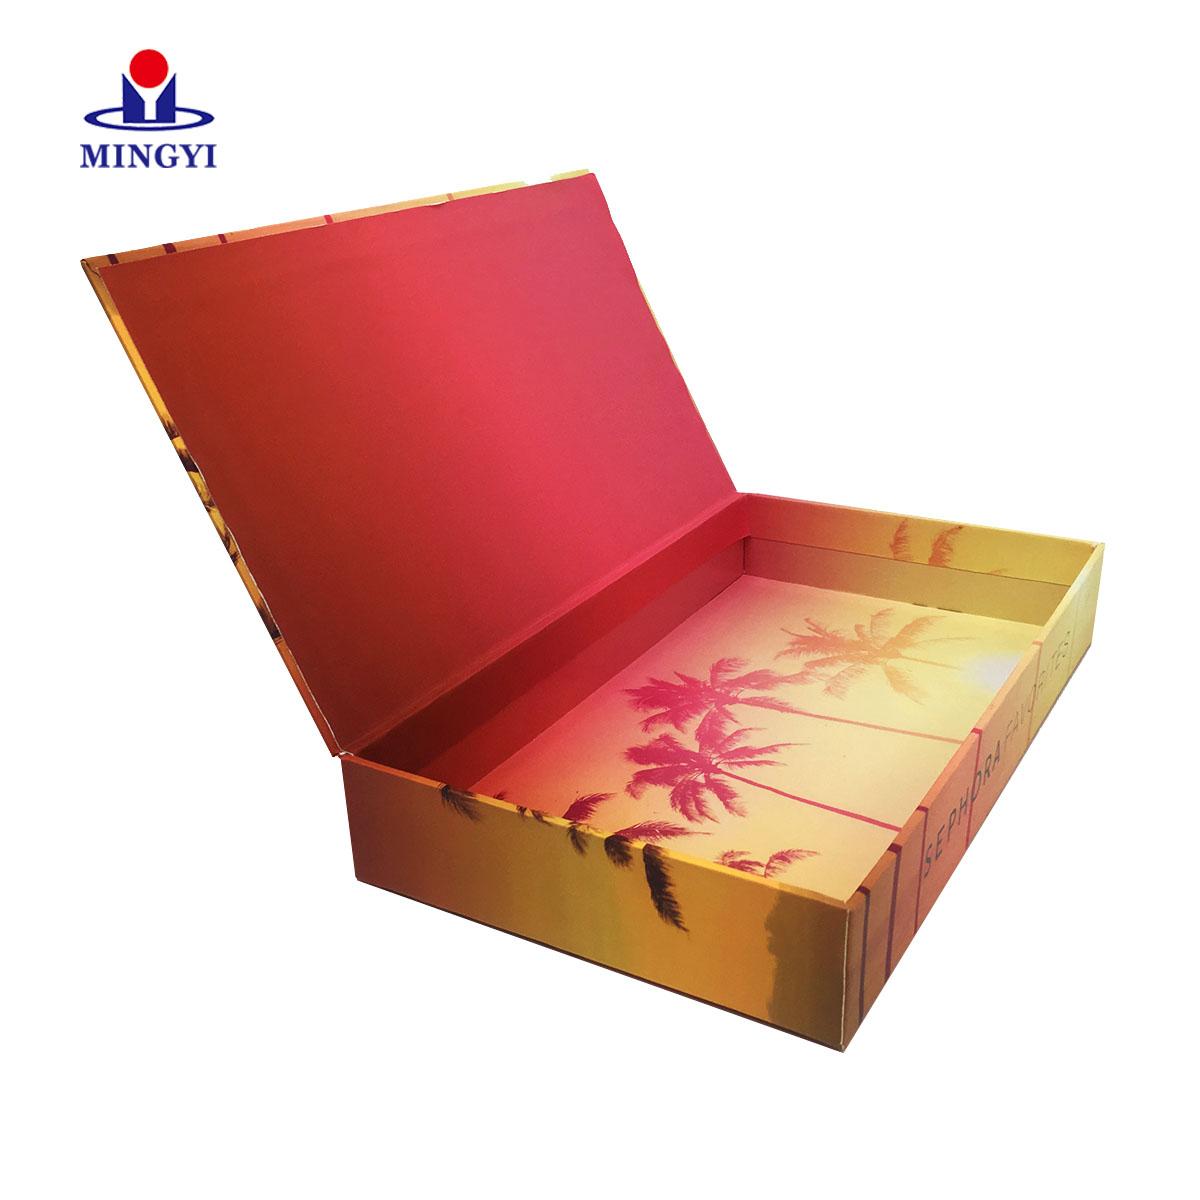 Mingyi Printing Array image121